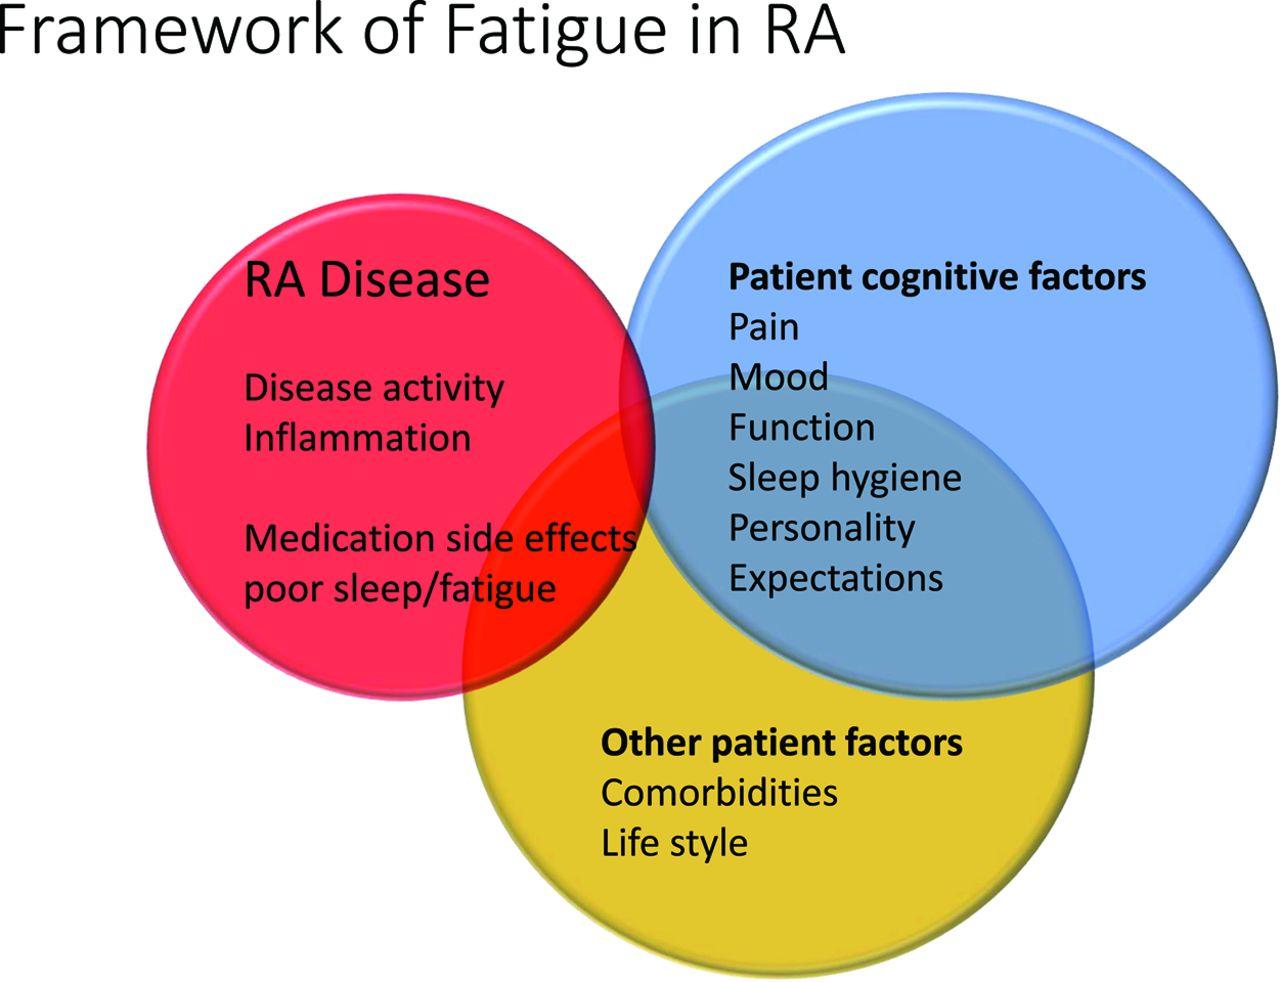 Management Of Fatigue In Rheumatoid Arthritis Rmd Open